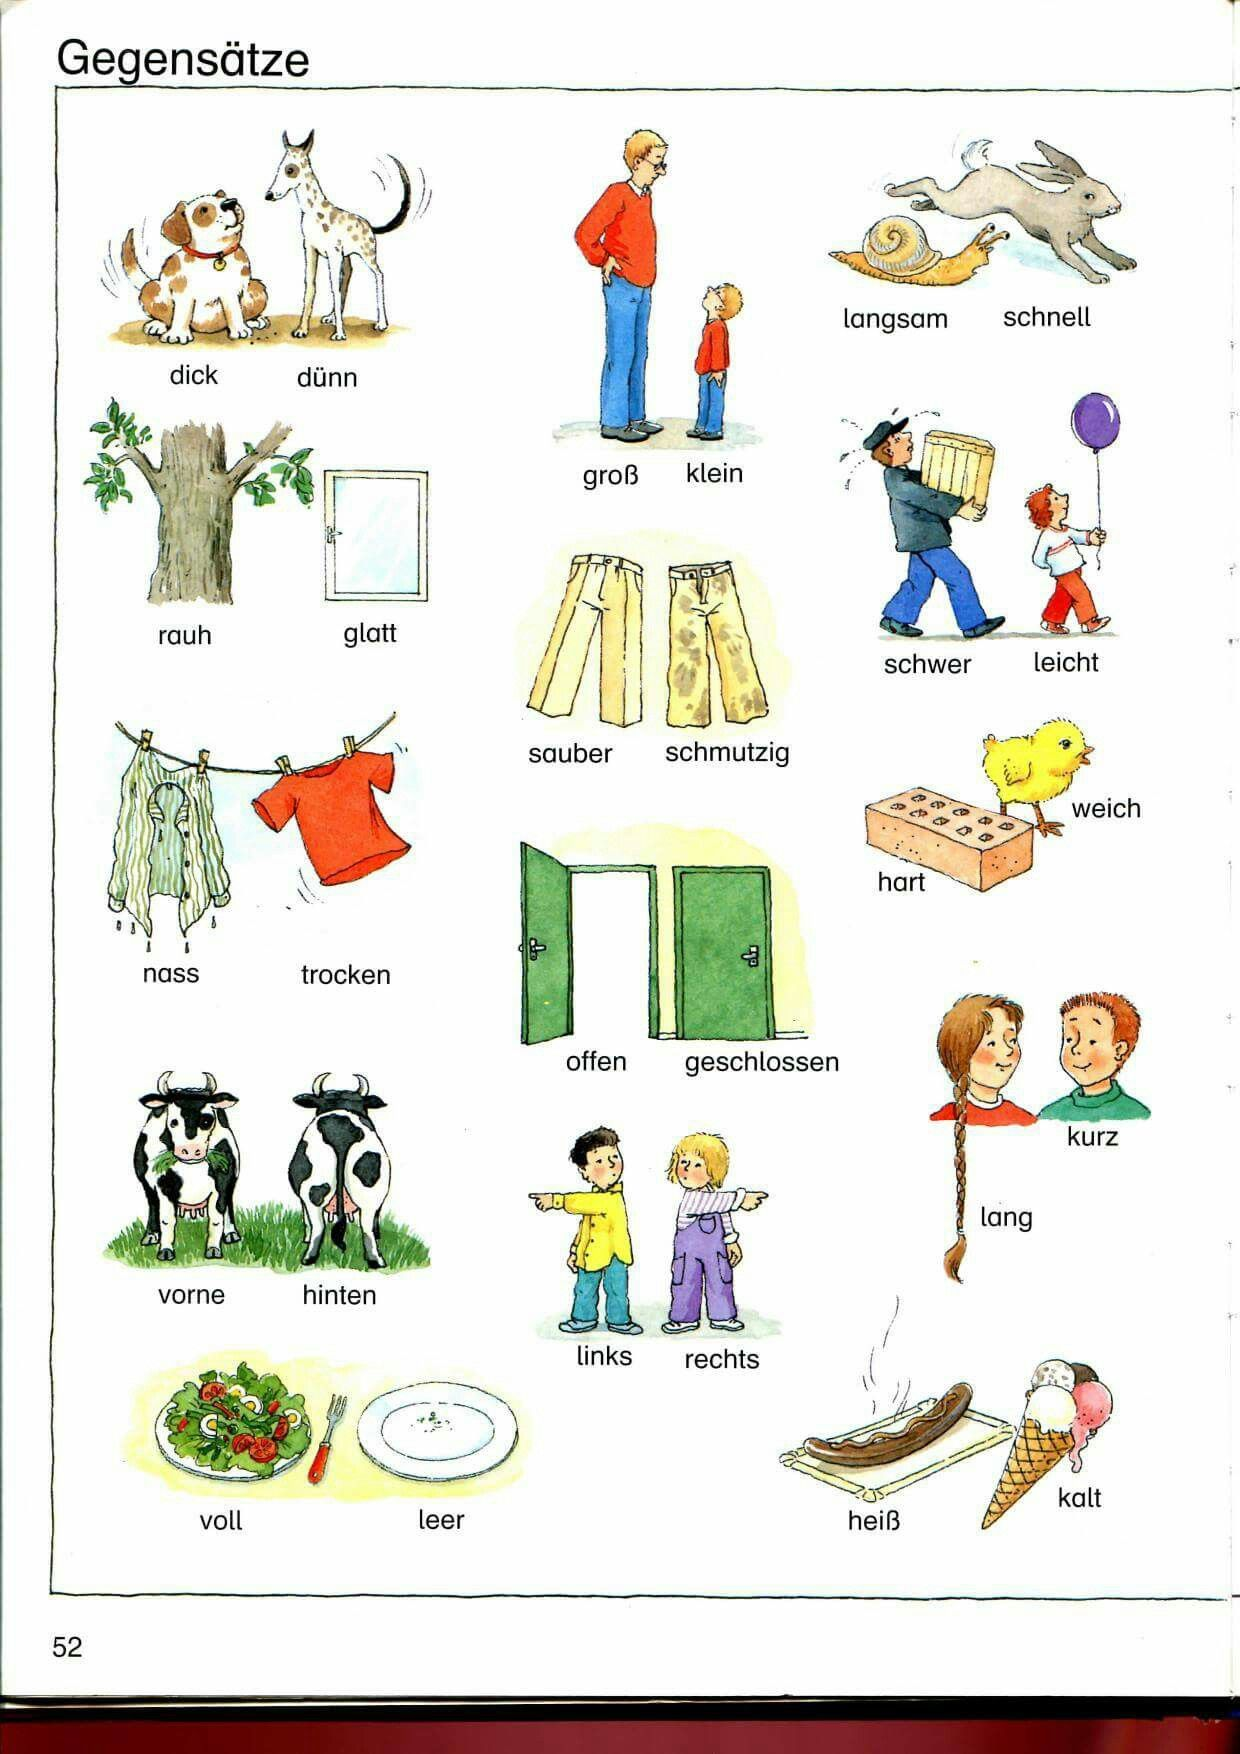 pin by naomi garnett on learning german german language learn german deutsch. Black Bedroom Furniture Sets. Home Design Ideas